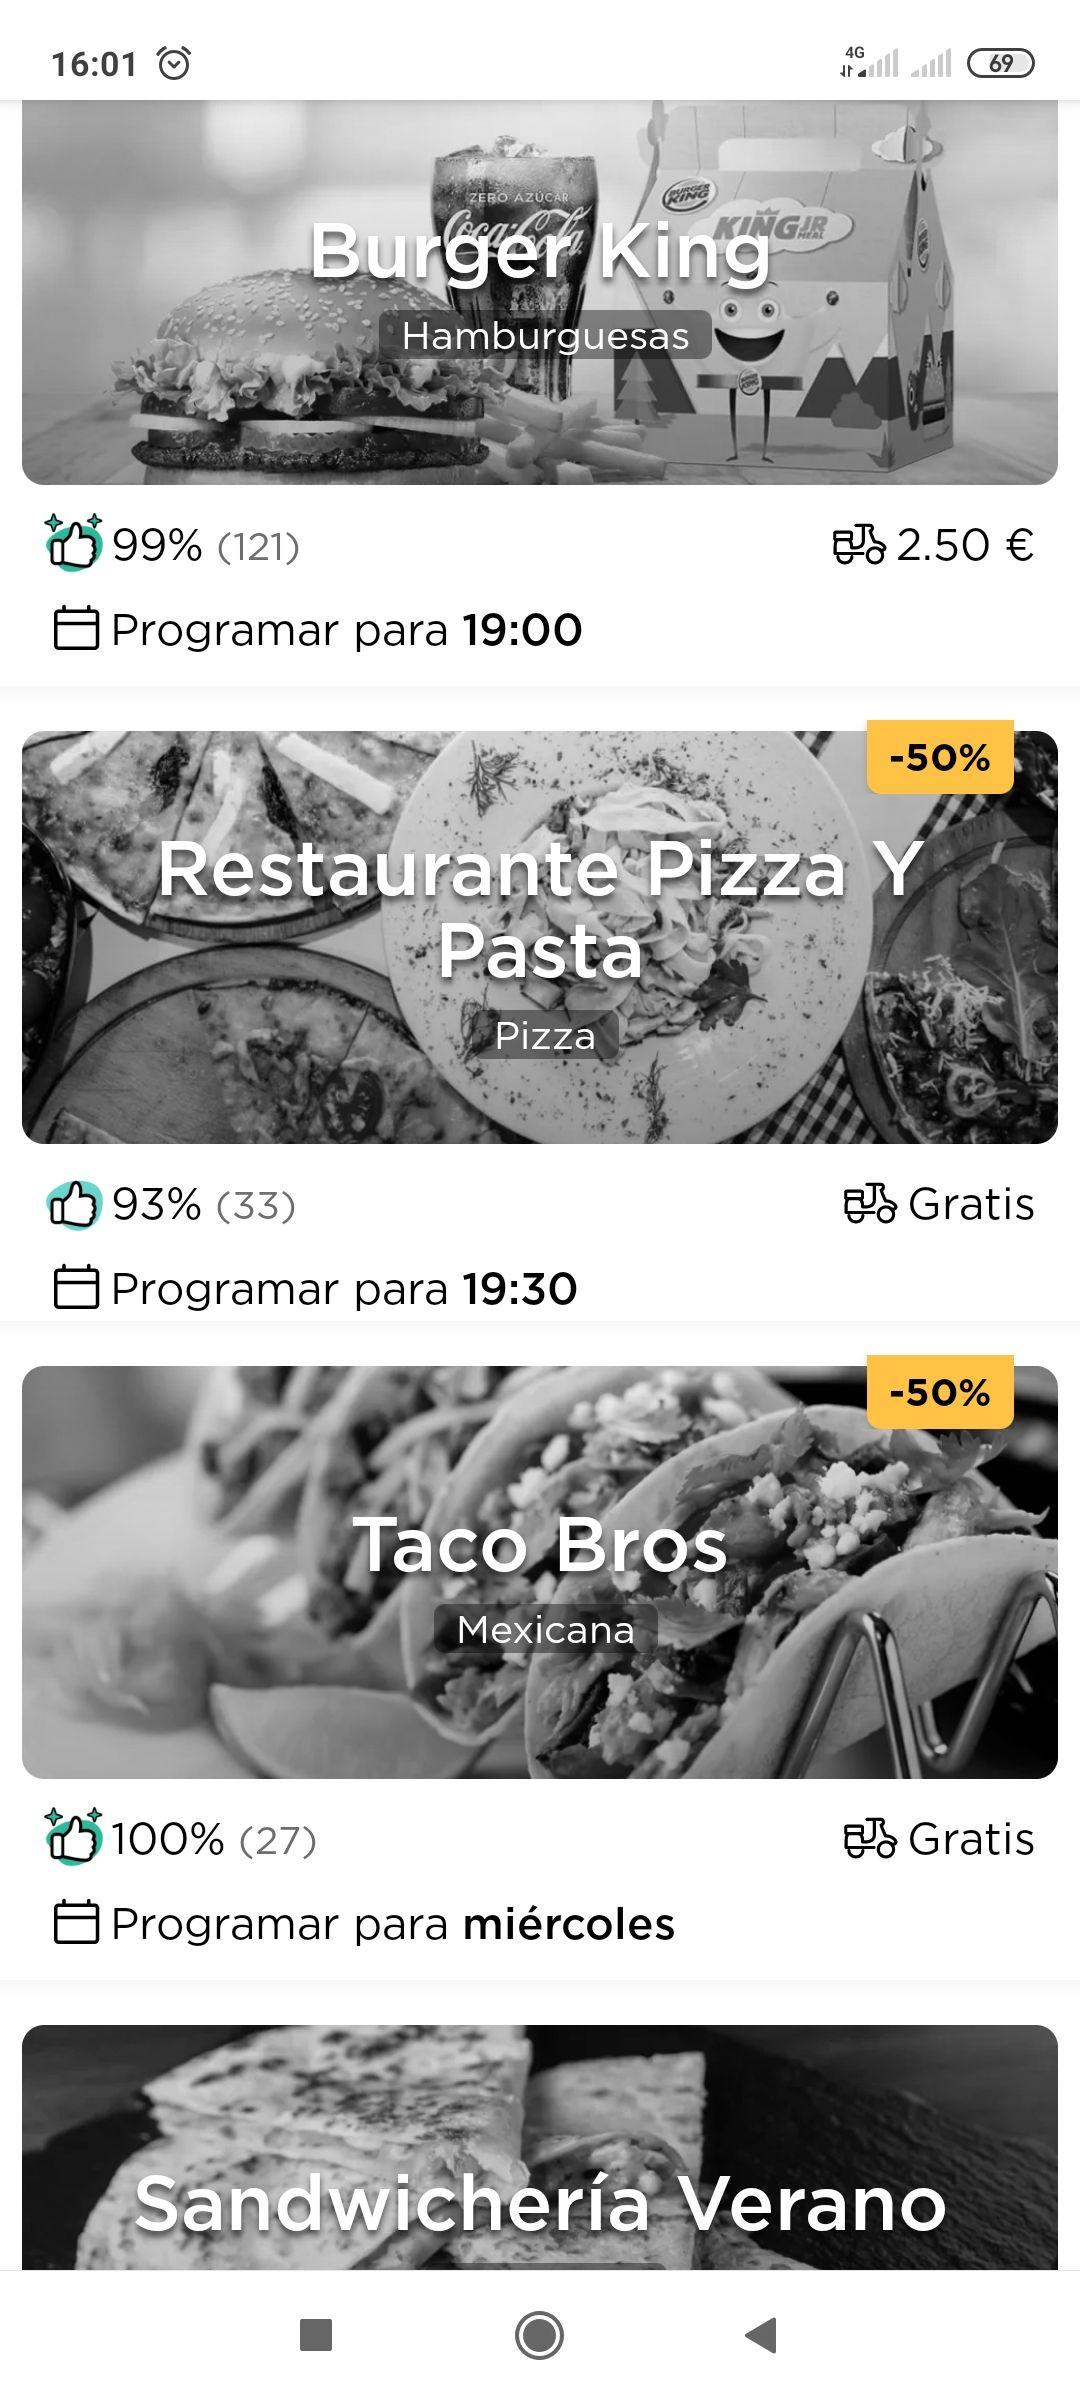 Glovo restaurantes al 50%